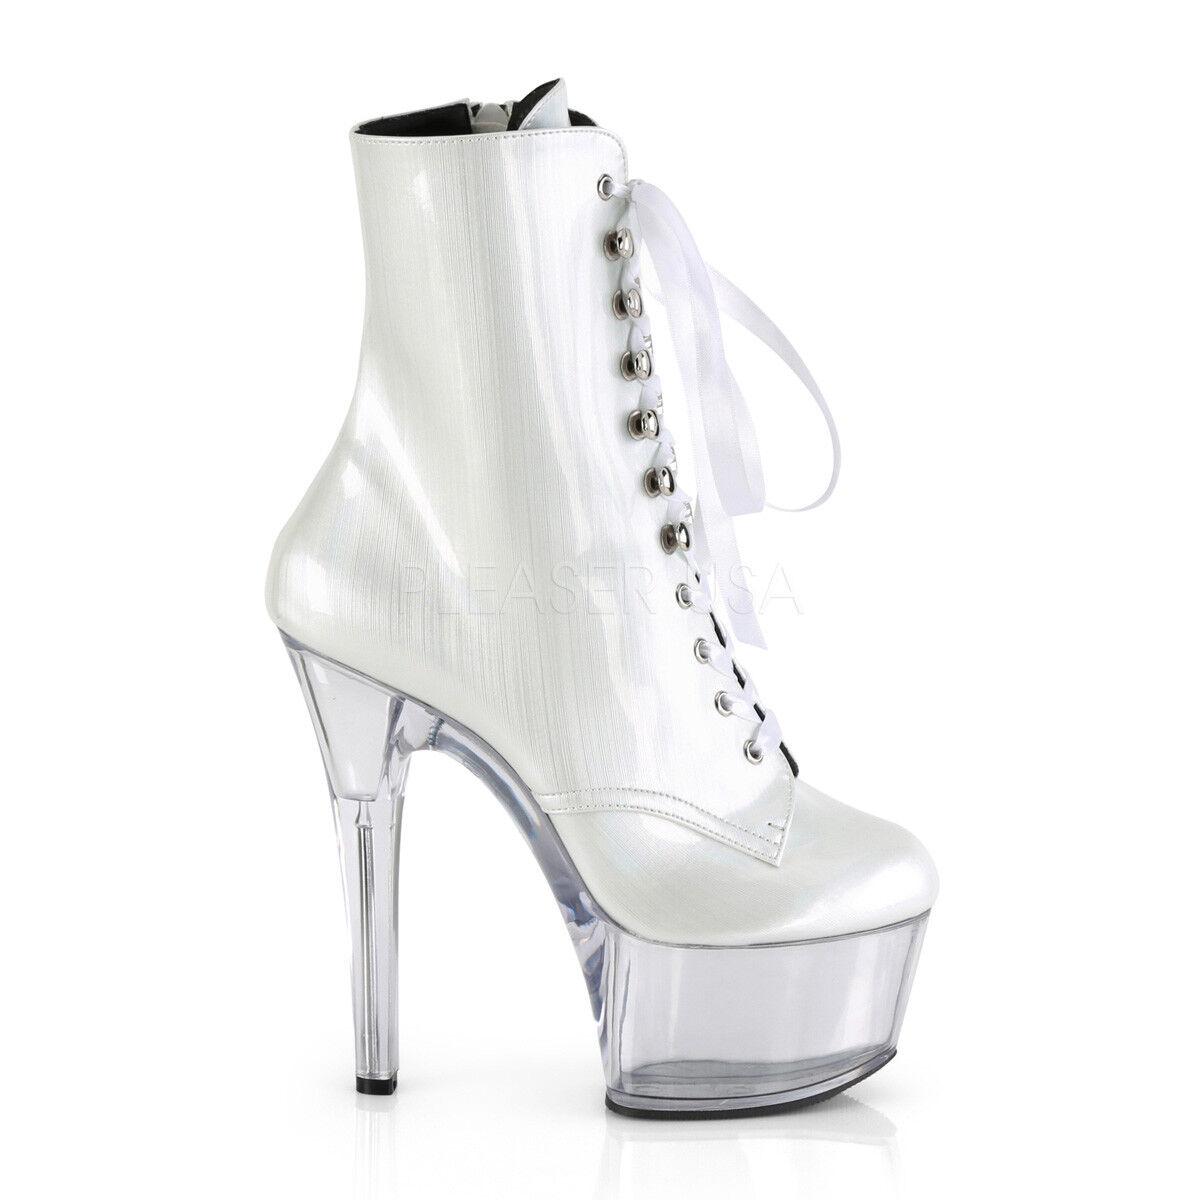 Aspire bianca Brush Hologram Patent 6  High Heel Platform Ankle avvio Dimensione 12